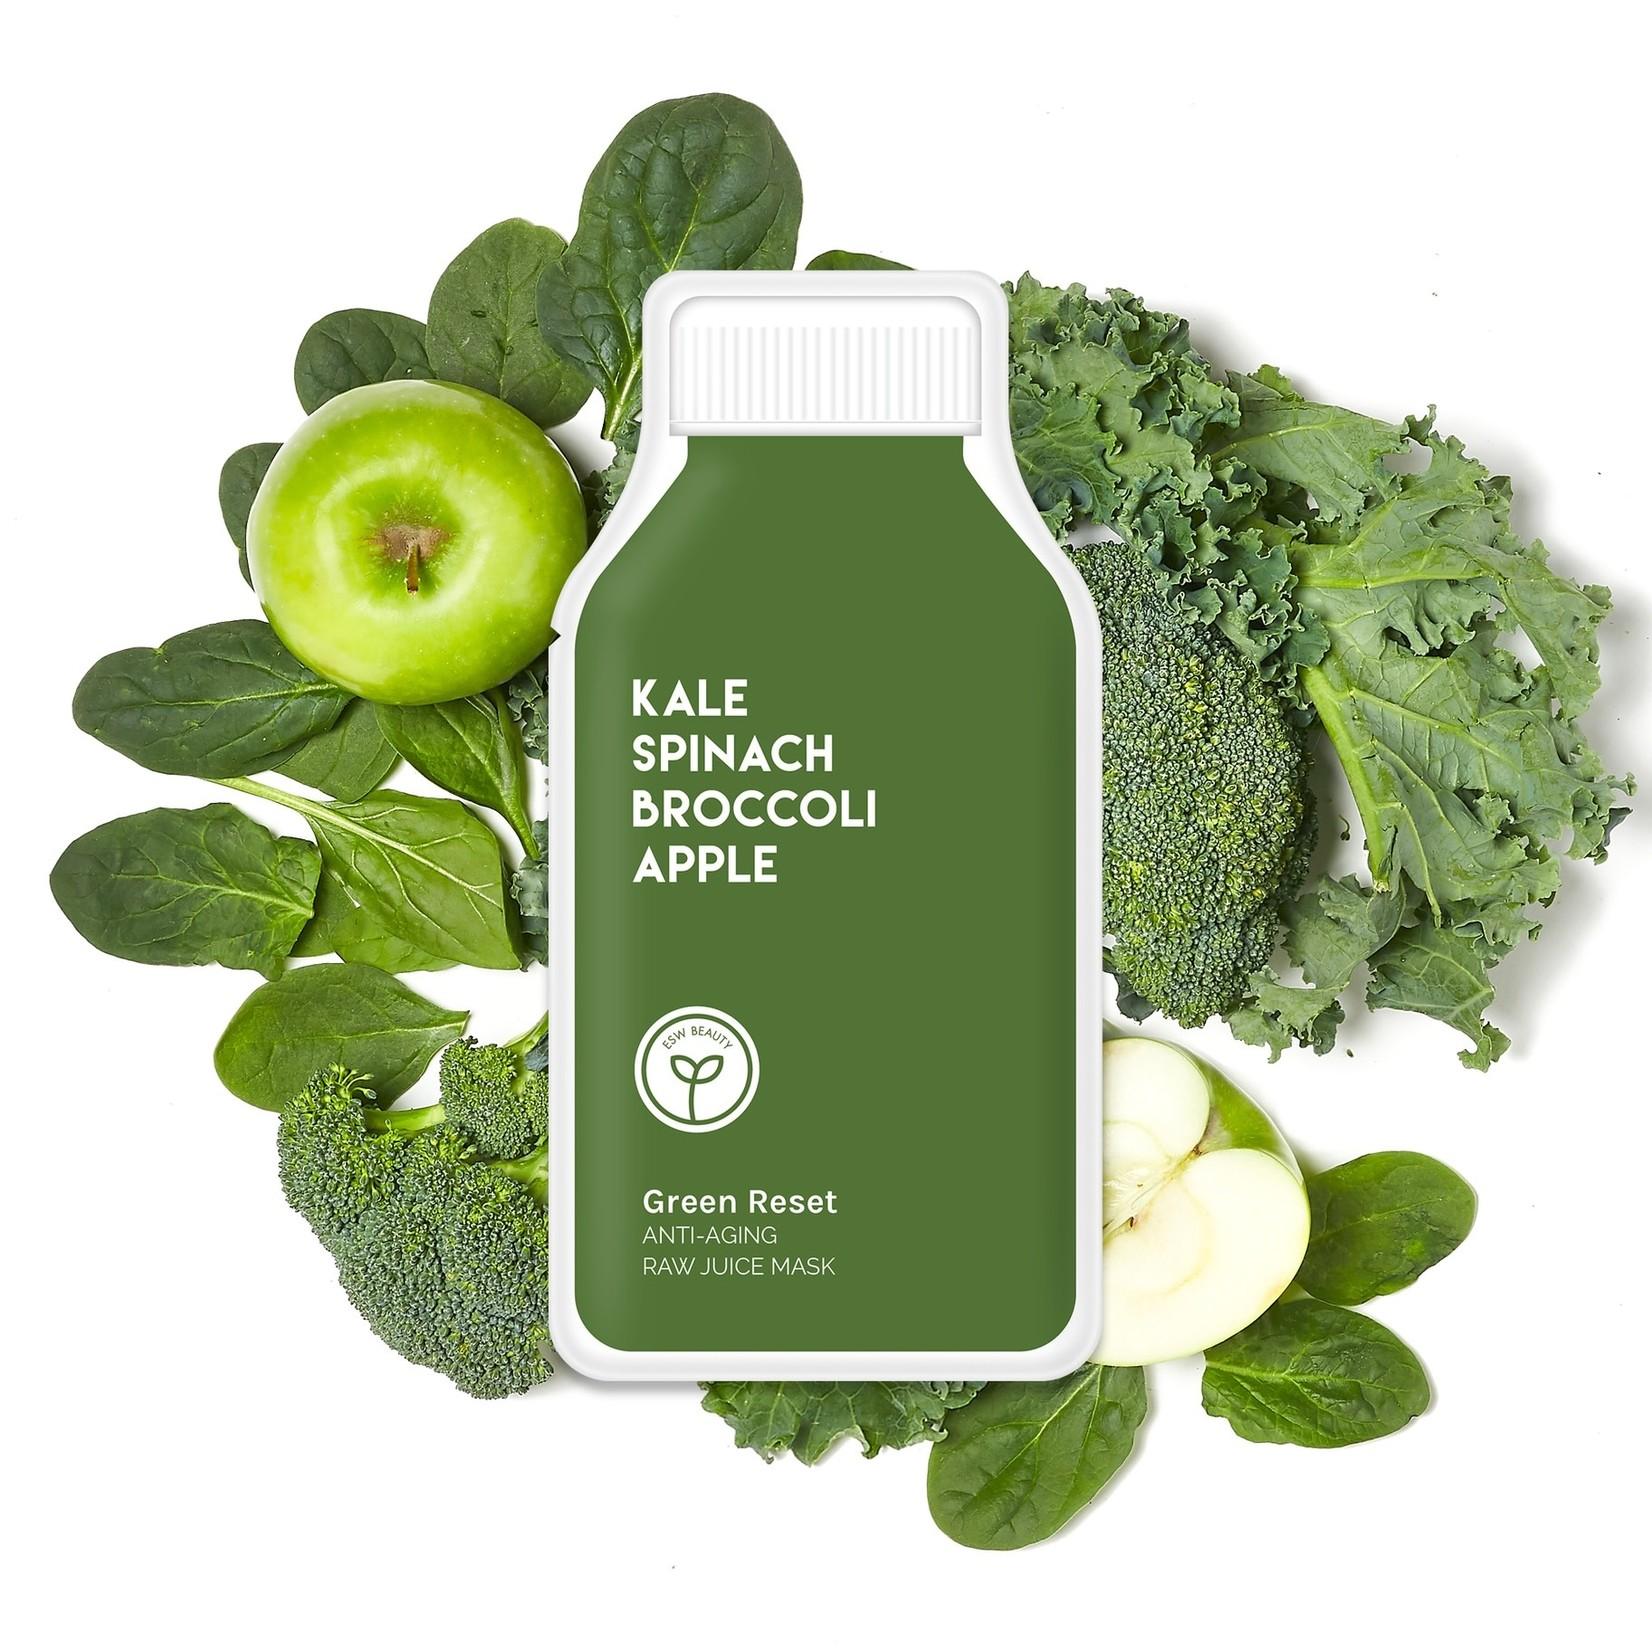 ESW Beauty Green Reset Anti Aging Raw Juice Mask